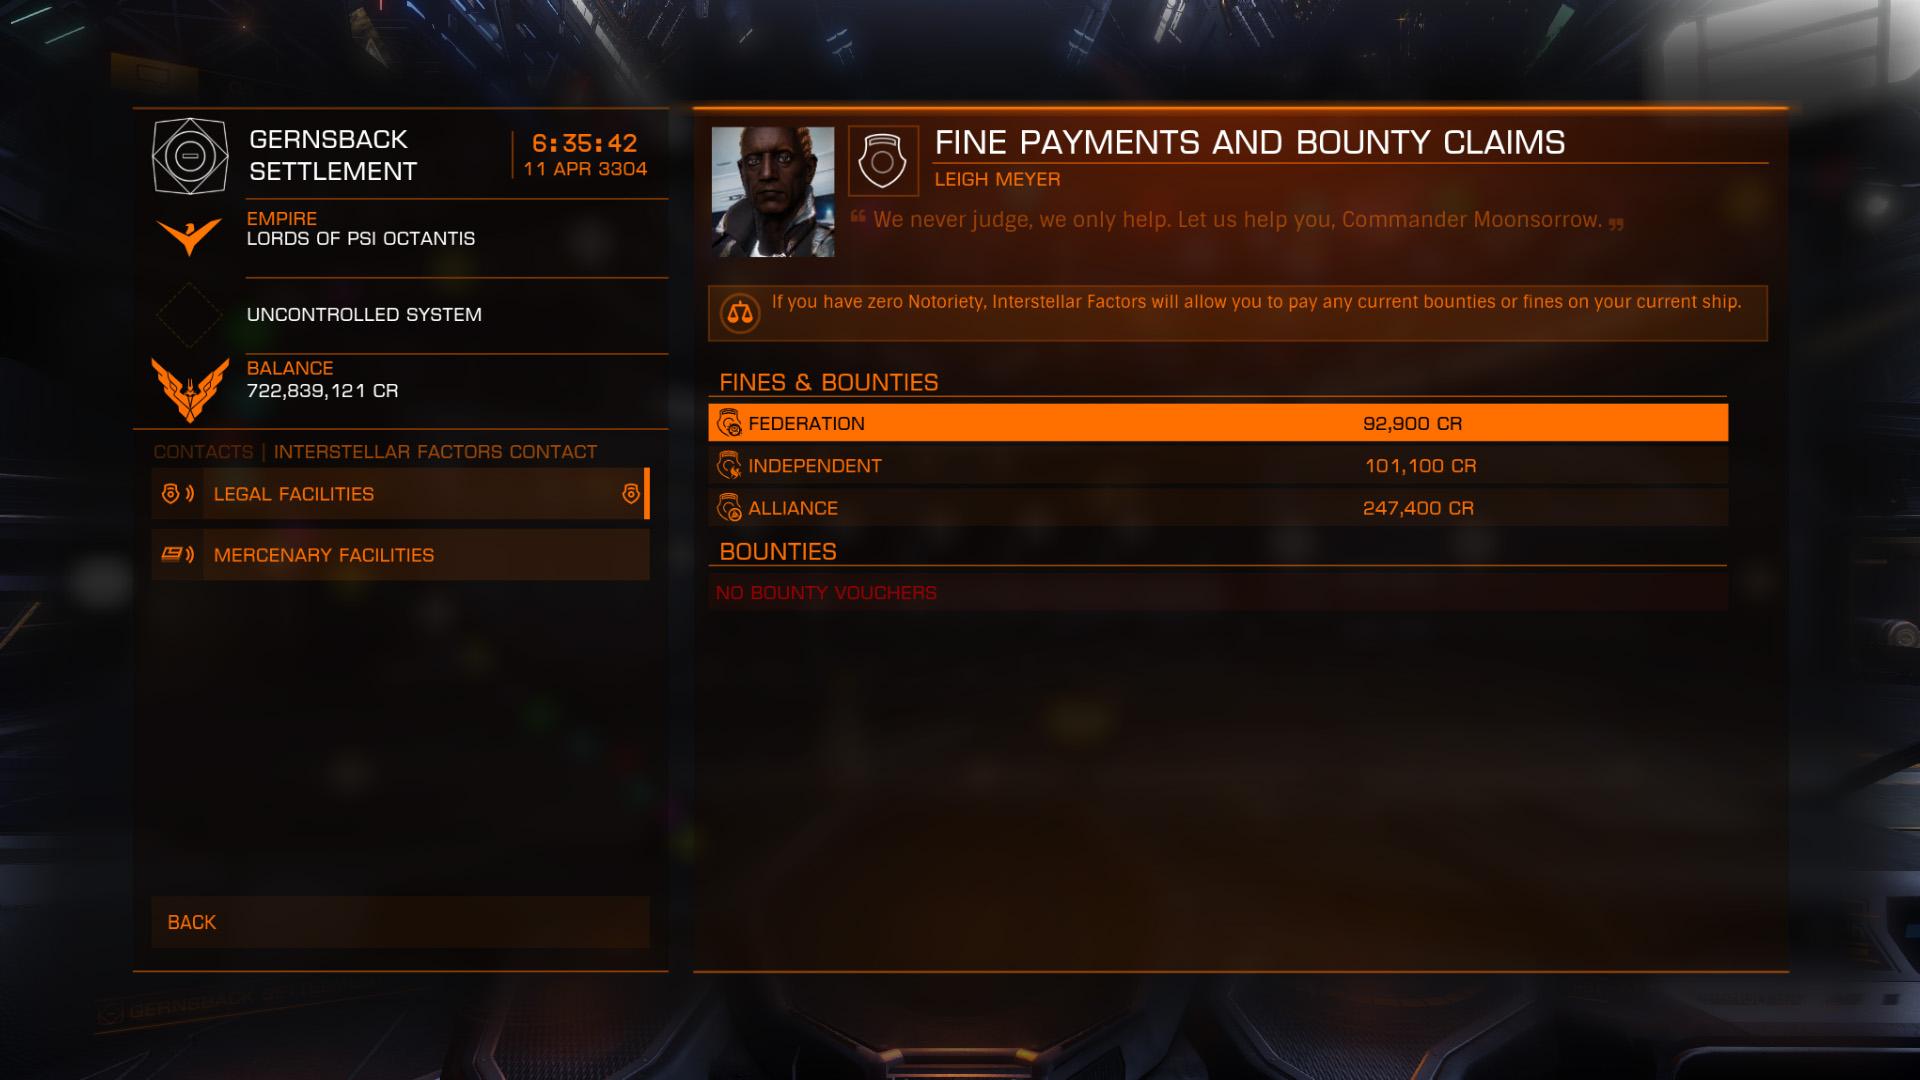 Elite: Dangerous beginner's guide: A screenshot showing the Interstellar Factors Contact